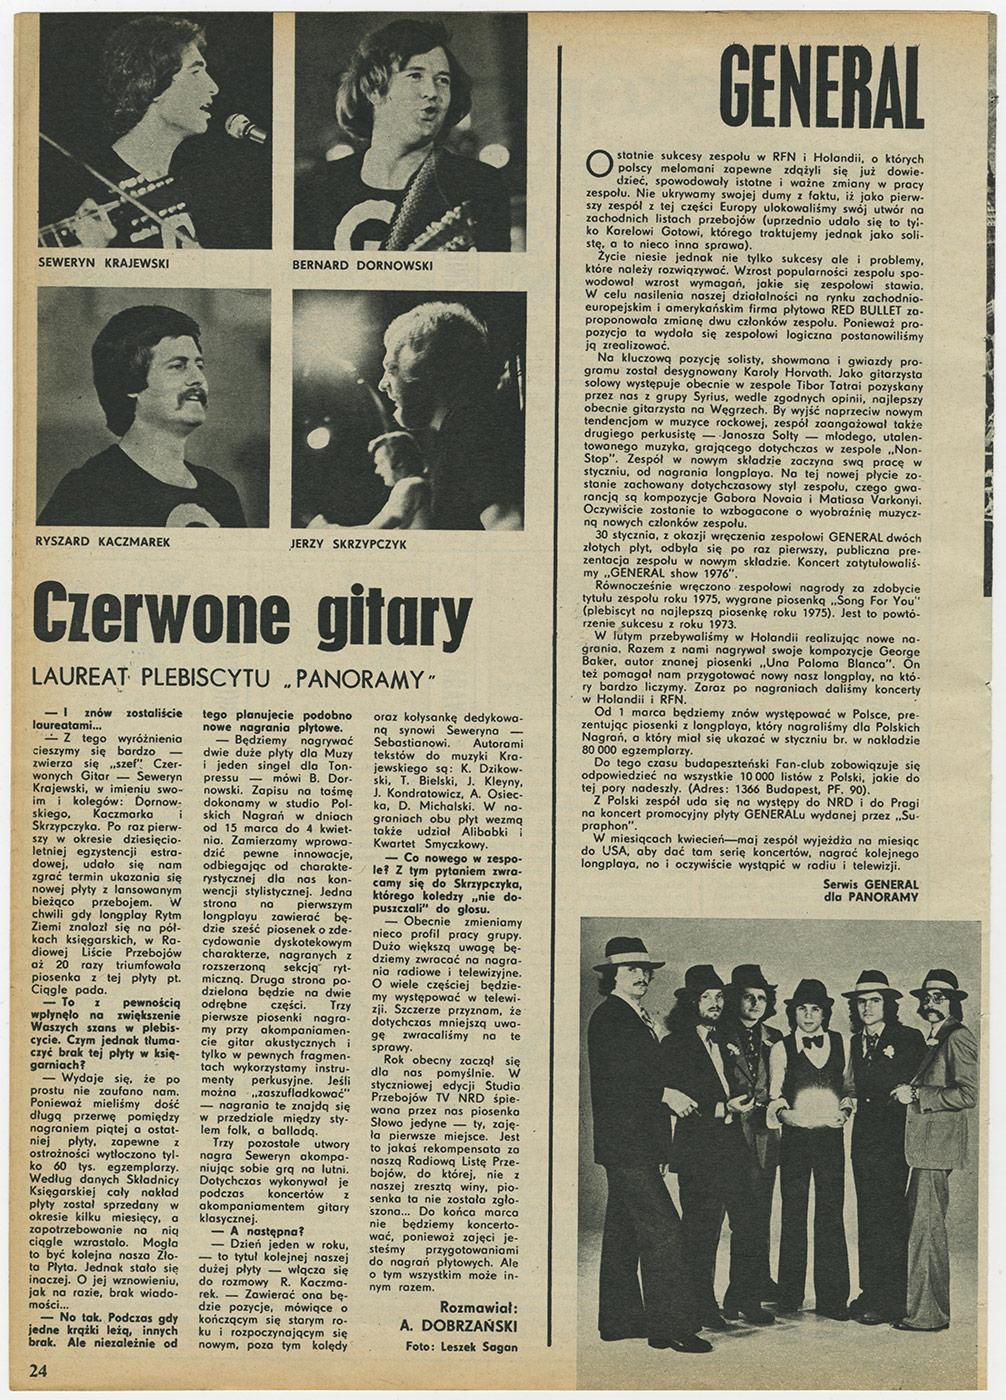 Czerwone gitary - laureat plebiscytu Panoramy. 7.03.1973 r.